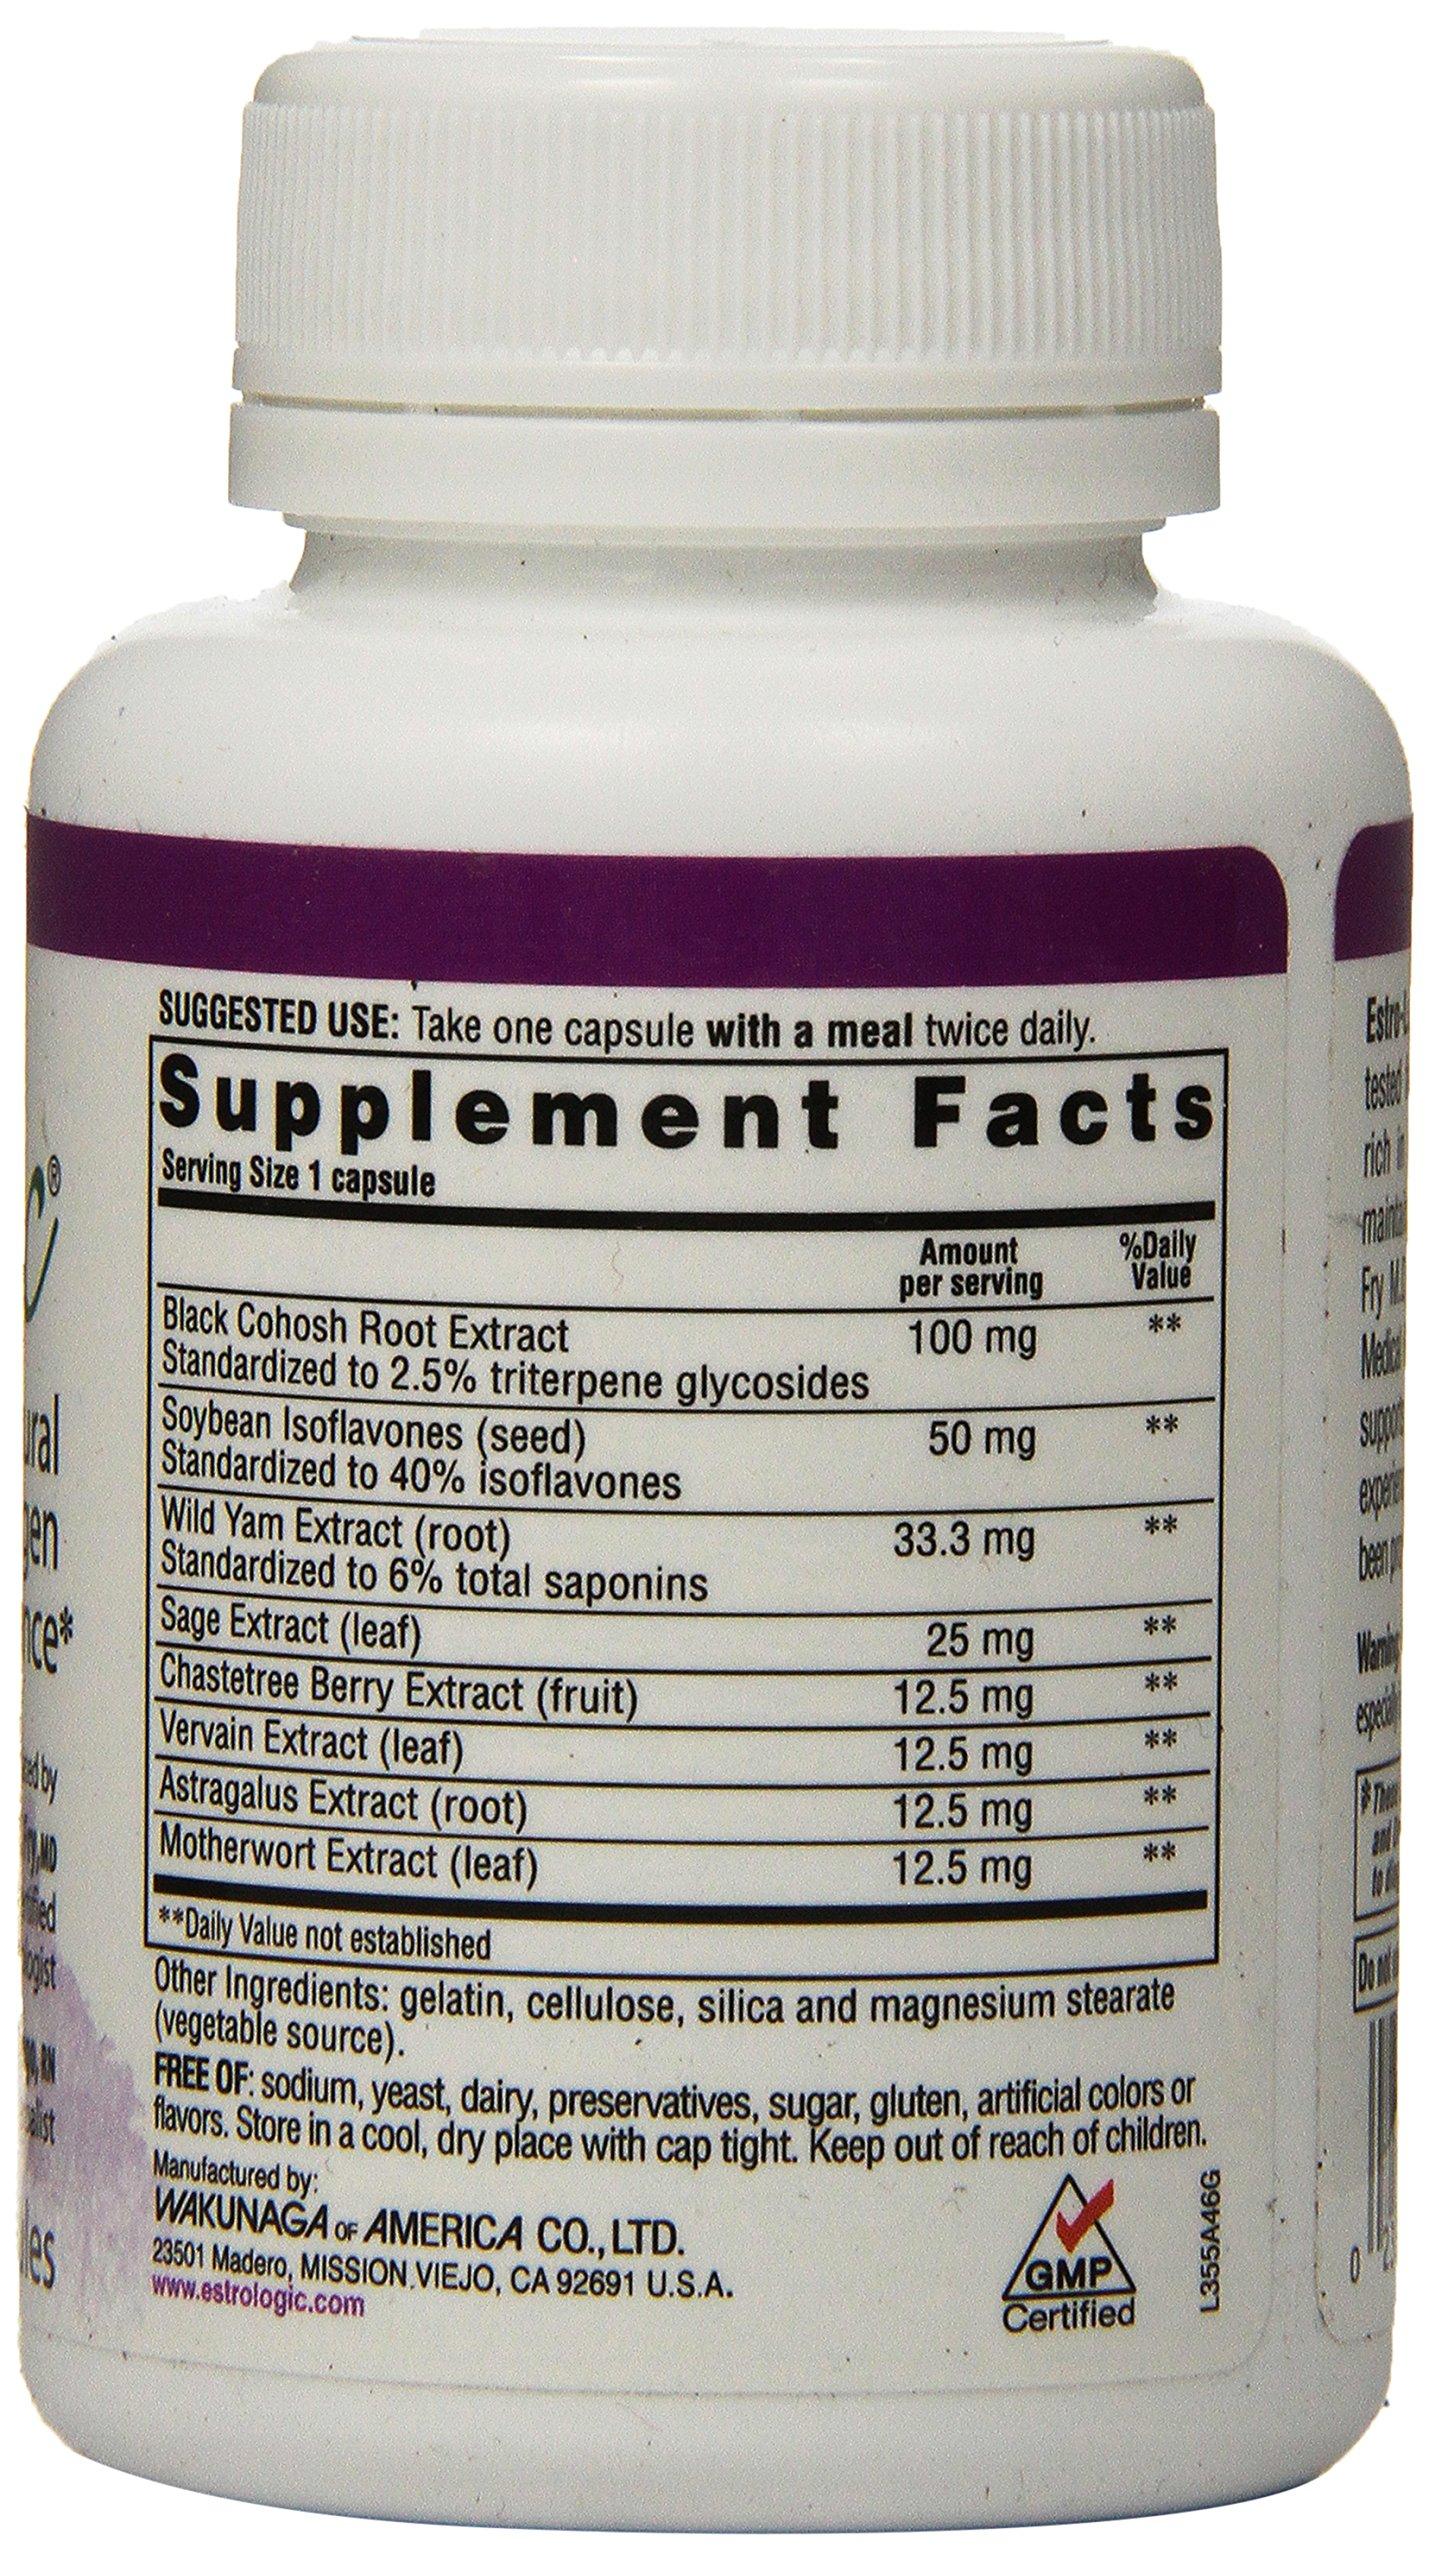 Kyolic Estro-Logic Natural Estrogen Balance (60 Capsules) Hormone Balance Support Supplement for Women Experiencing Menopause or Peri-Menopause